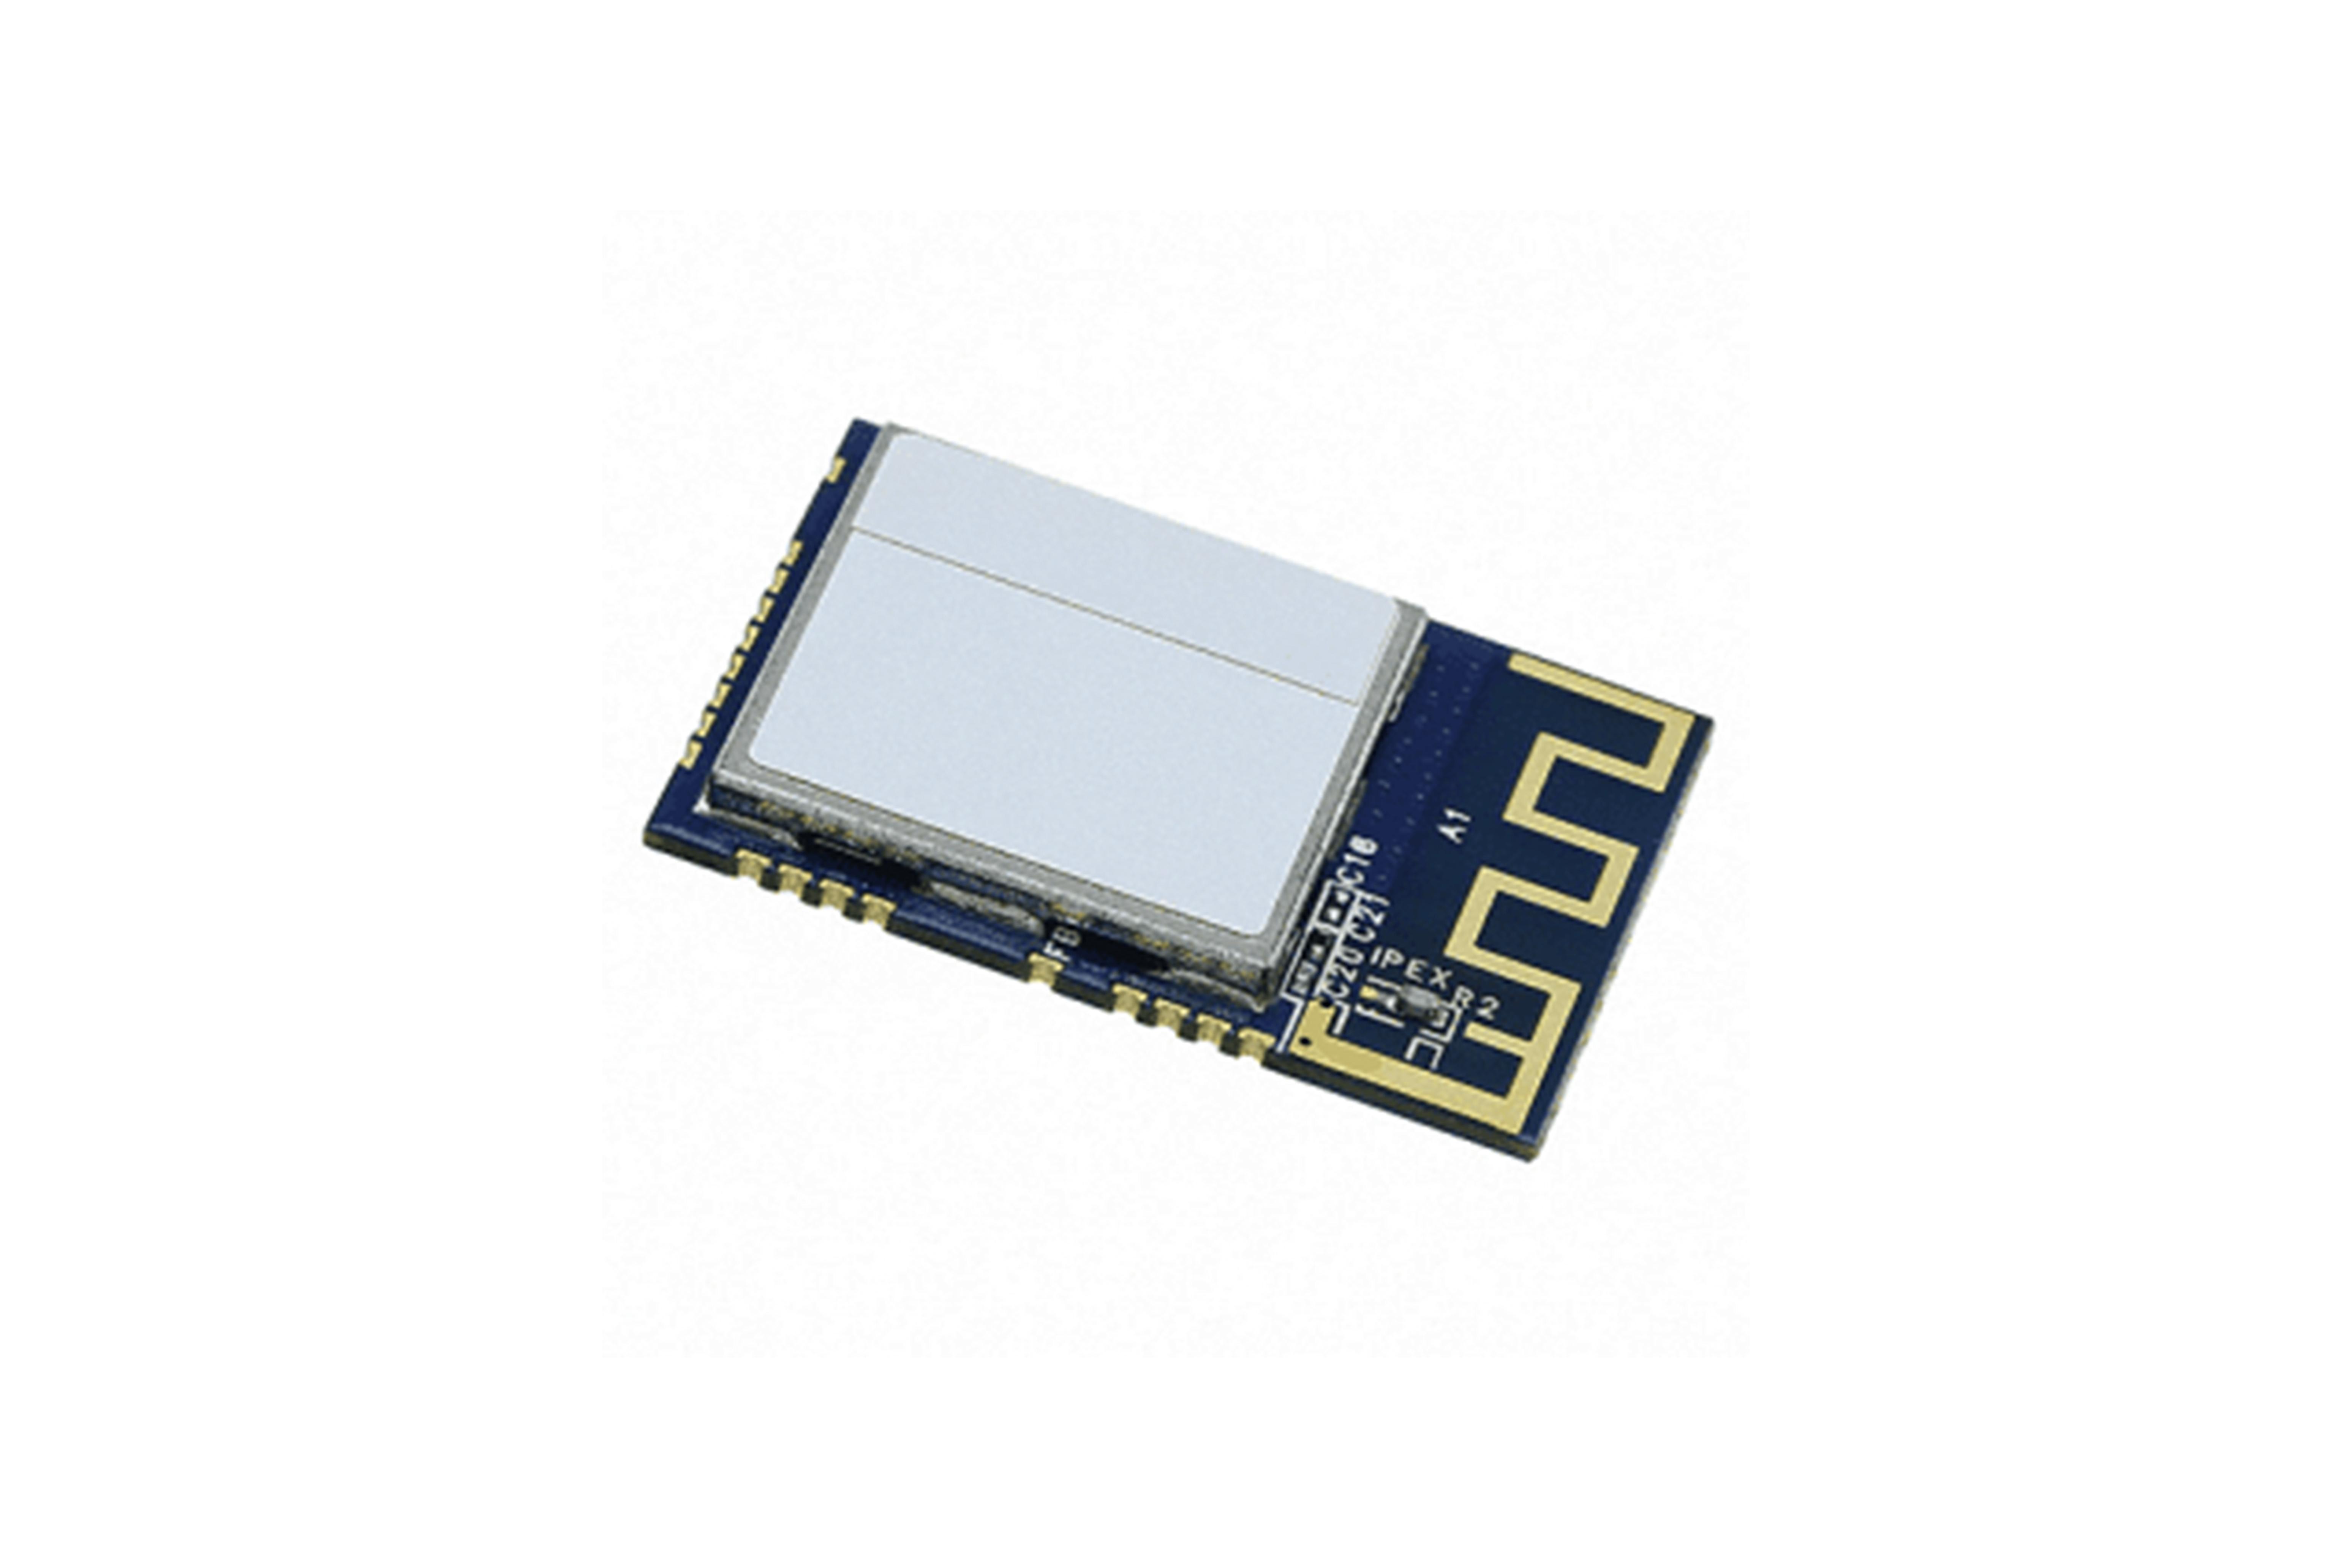 Smartconnect Atwilc1000 802.11 B/G/N Mod